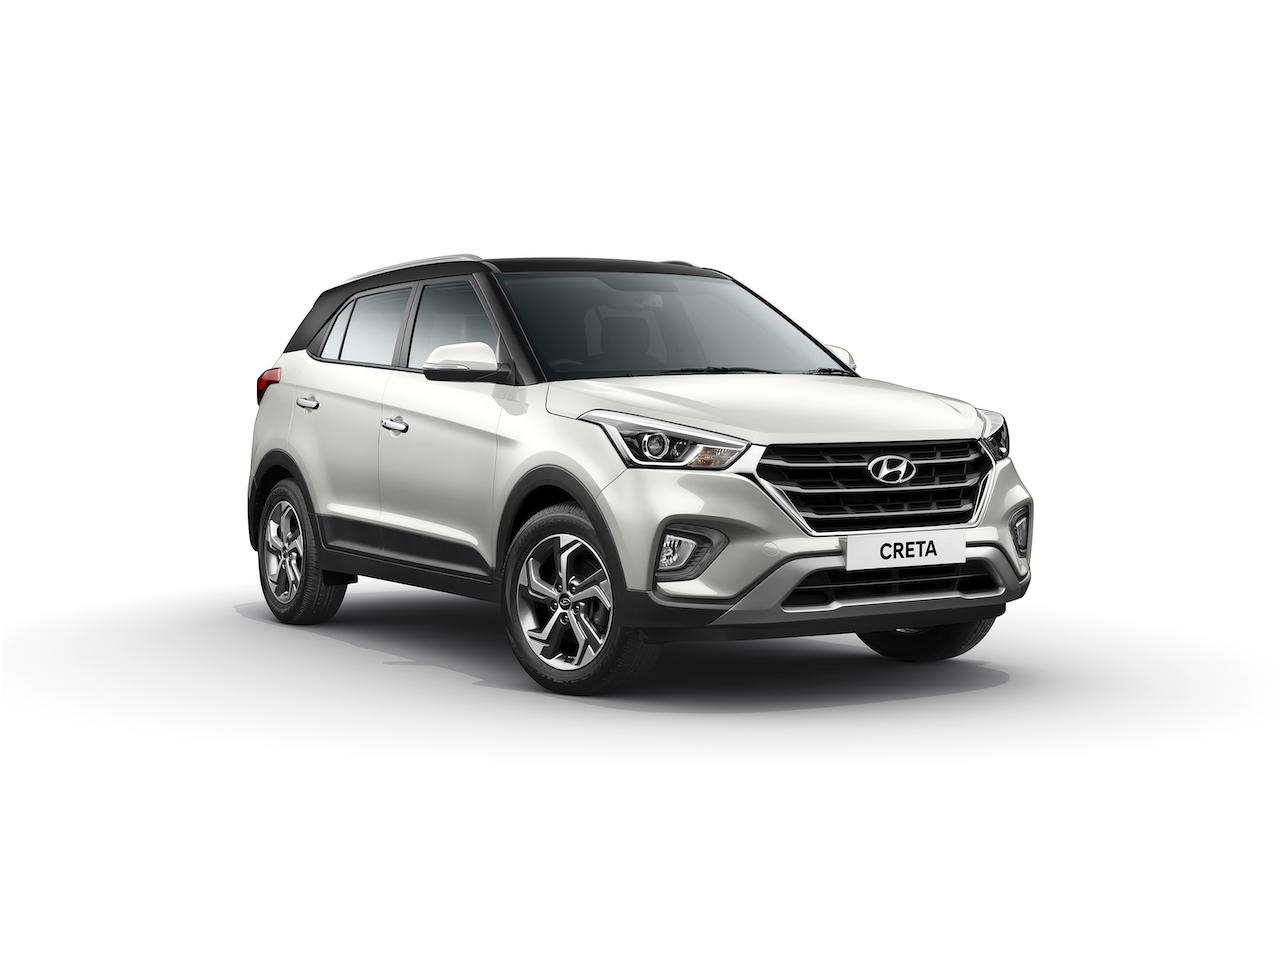 Cara a cara; Hyundai Creta y Suzuki S-Cross